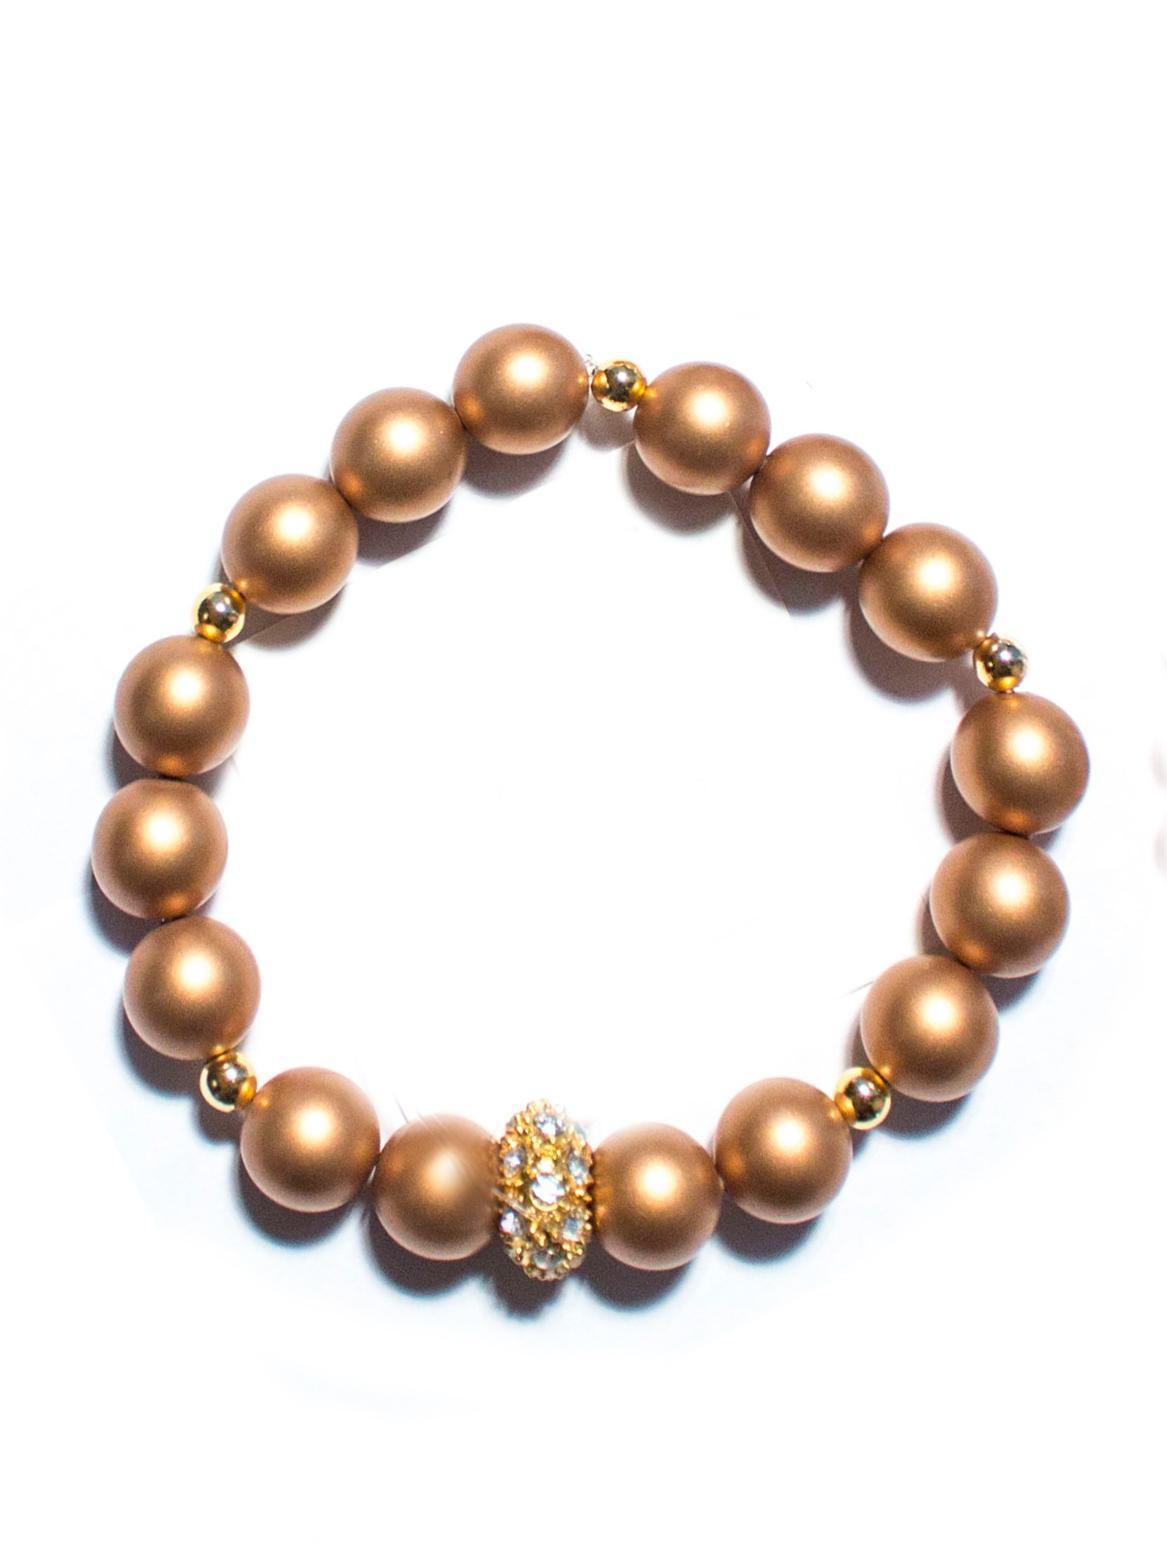 Asesoría de imagen ejecutiva - Pulsera Gold Crown - Hard Chic - VIPSOUL